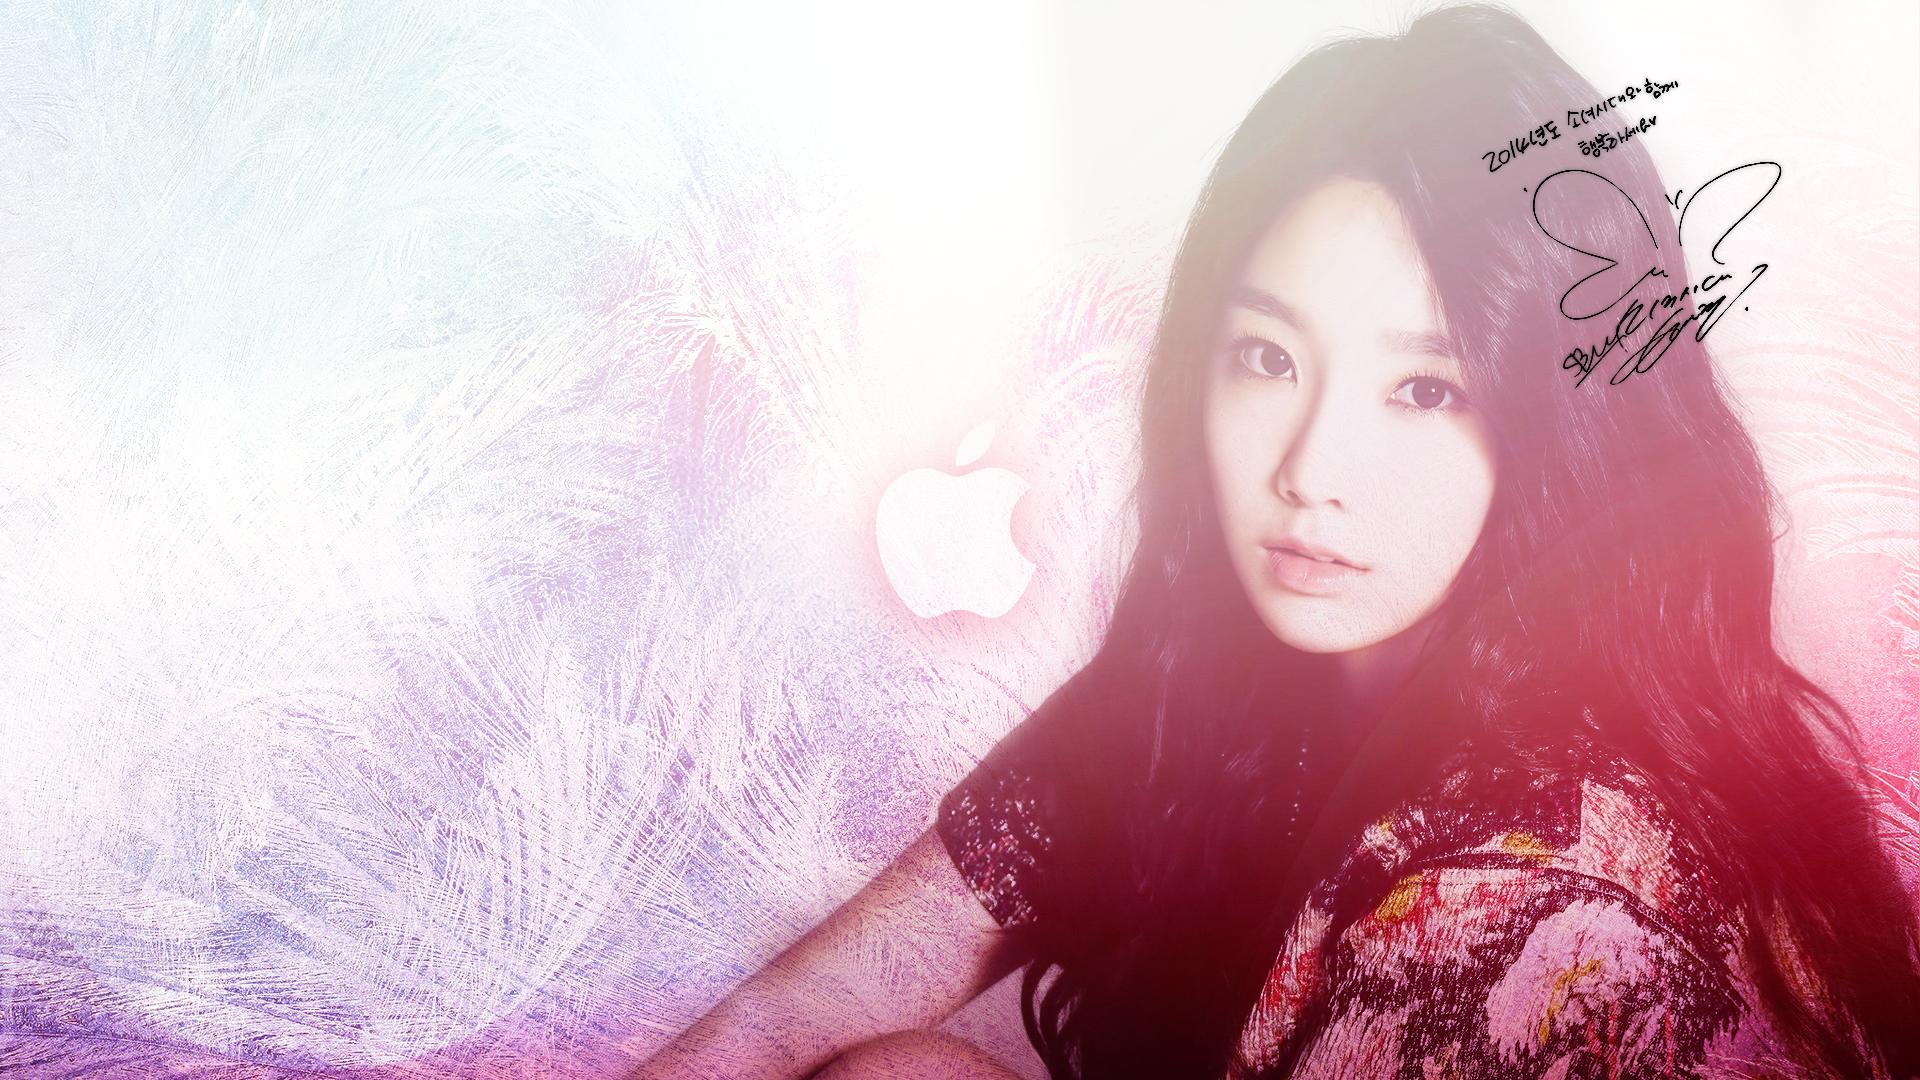 Taeyeon 2014 Wallpaper Mac by sbnetwork 1920x1080